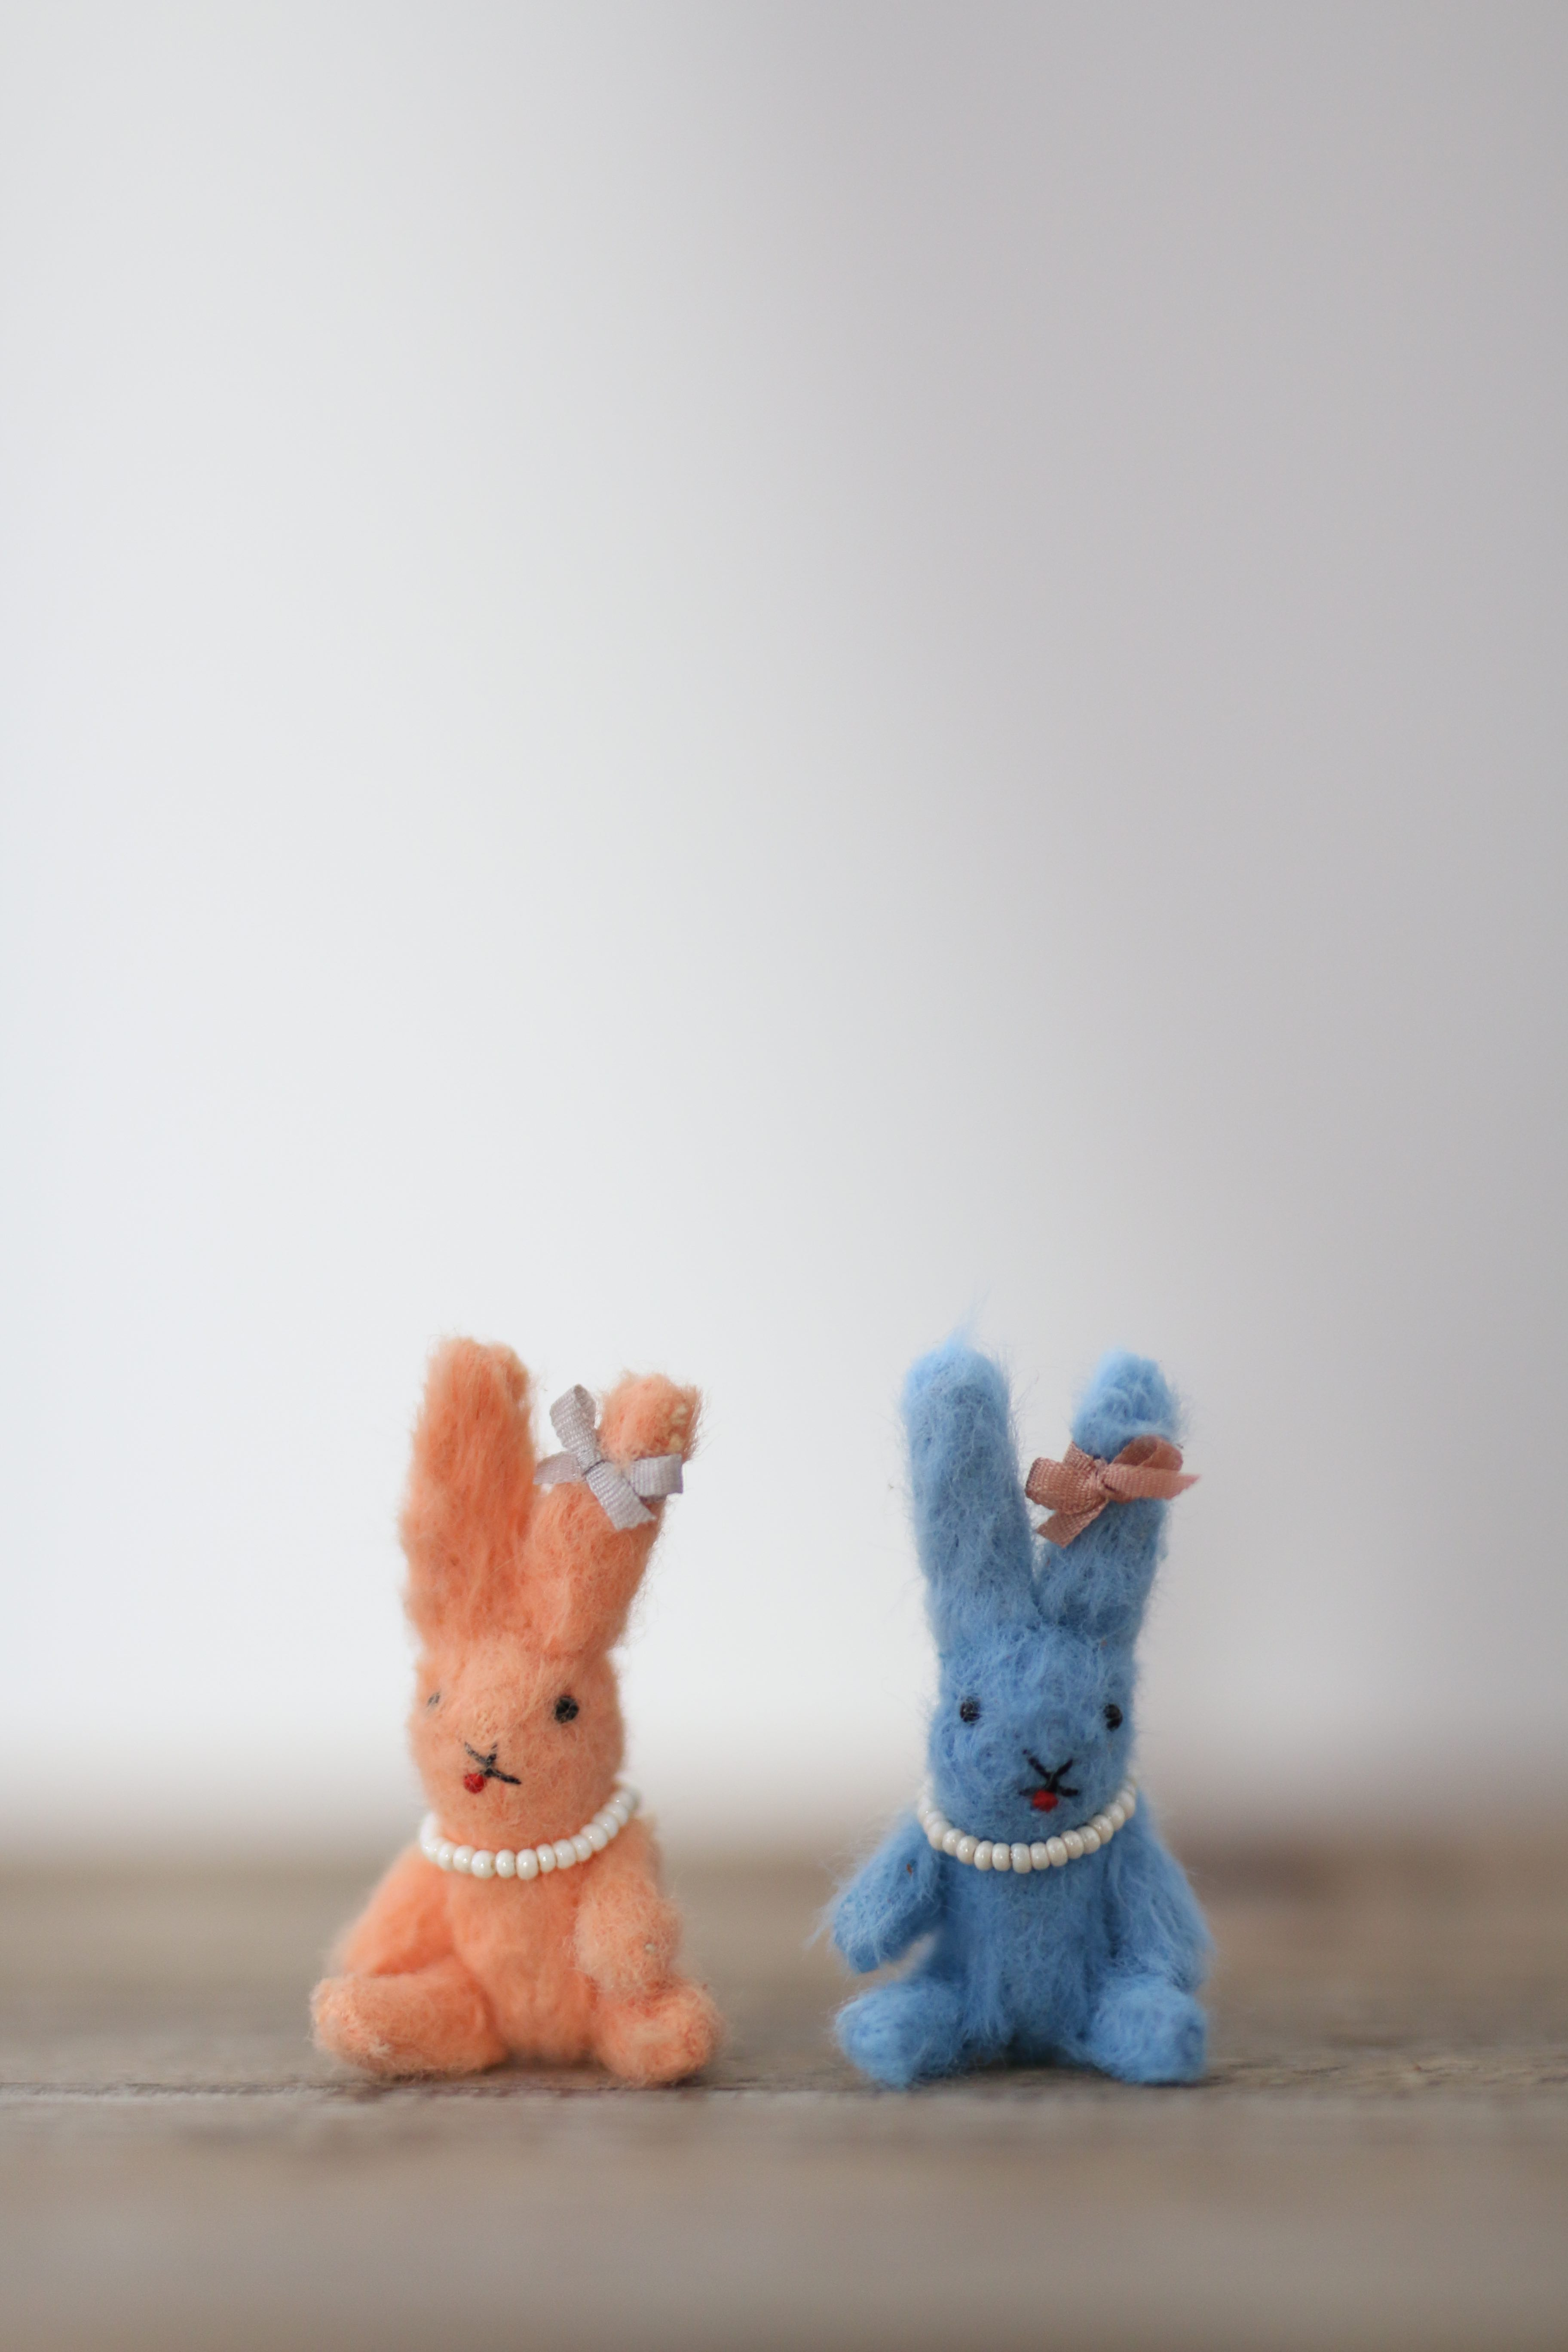 Easter Luv-Hug Exhibition 2017